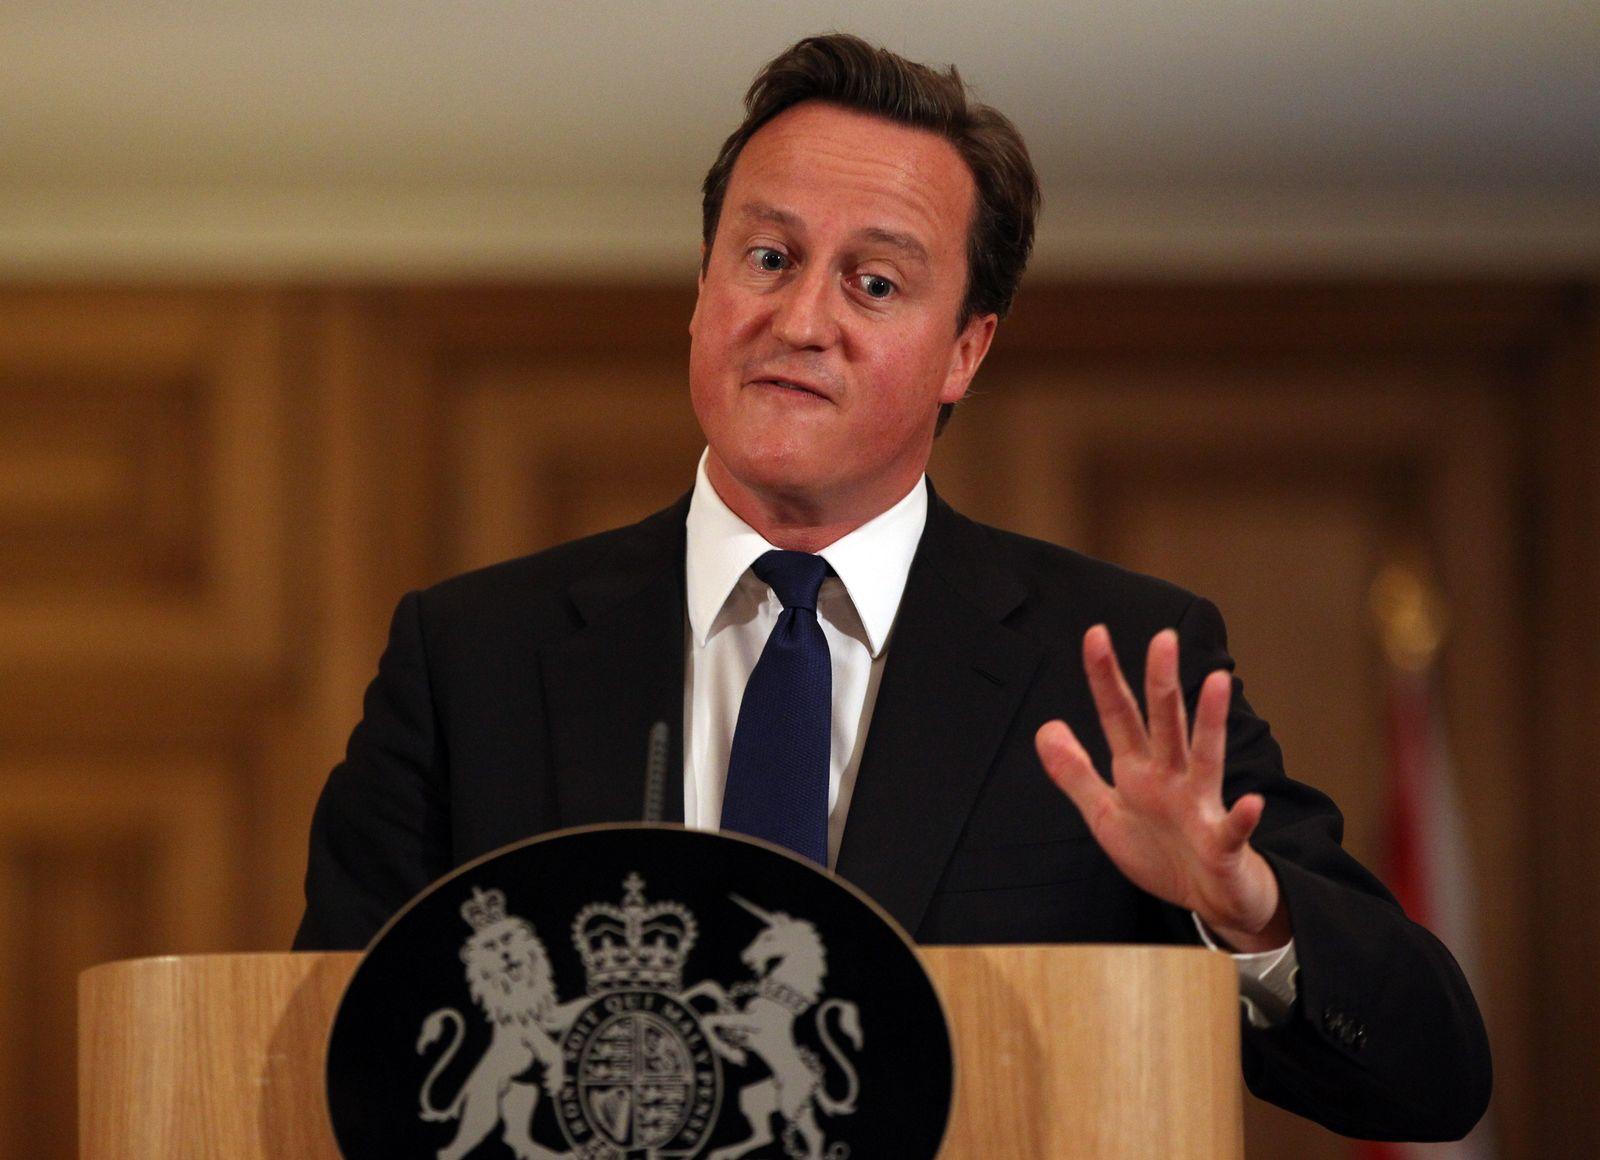 Flash David Cameron